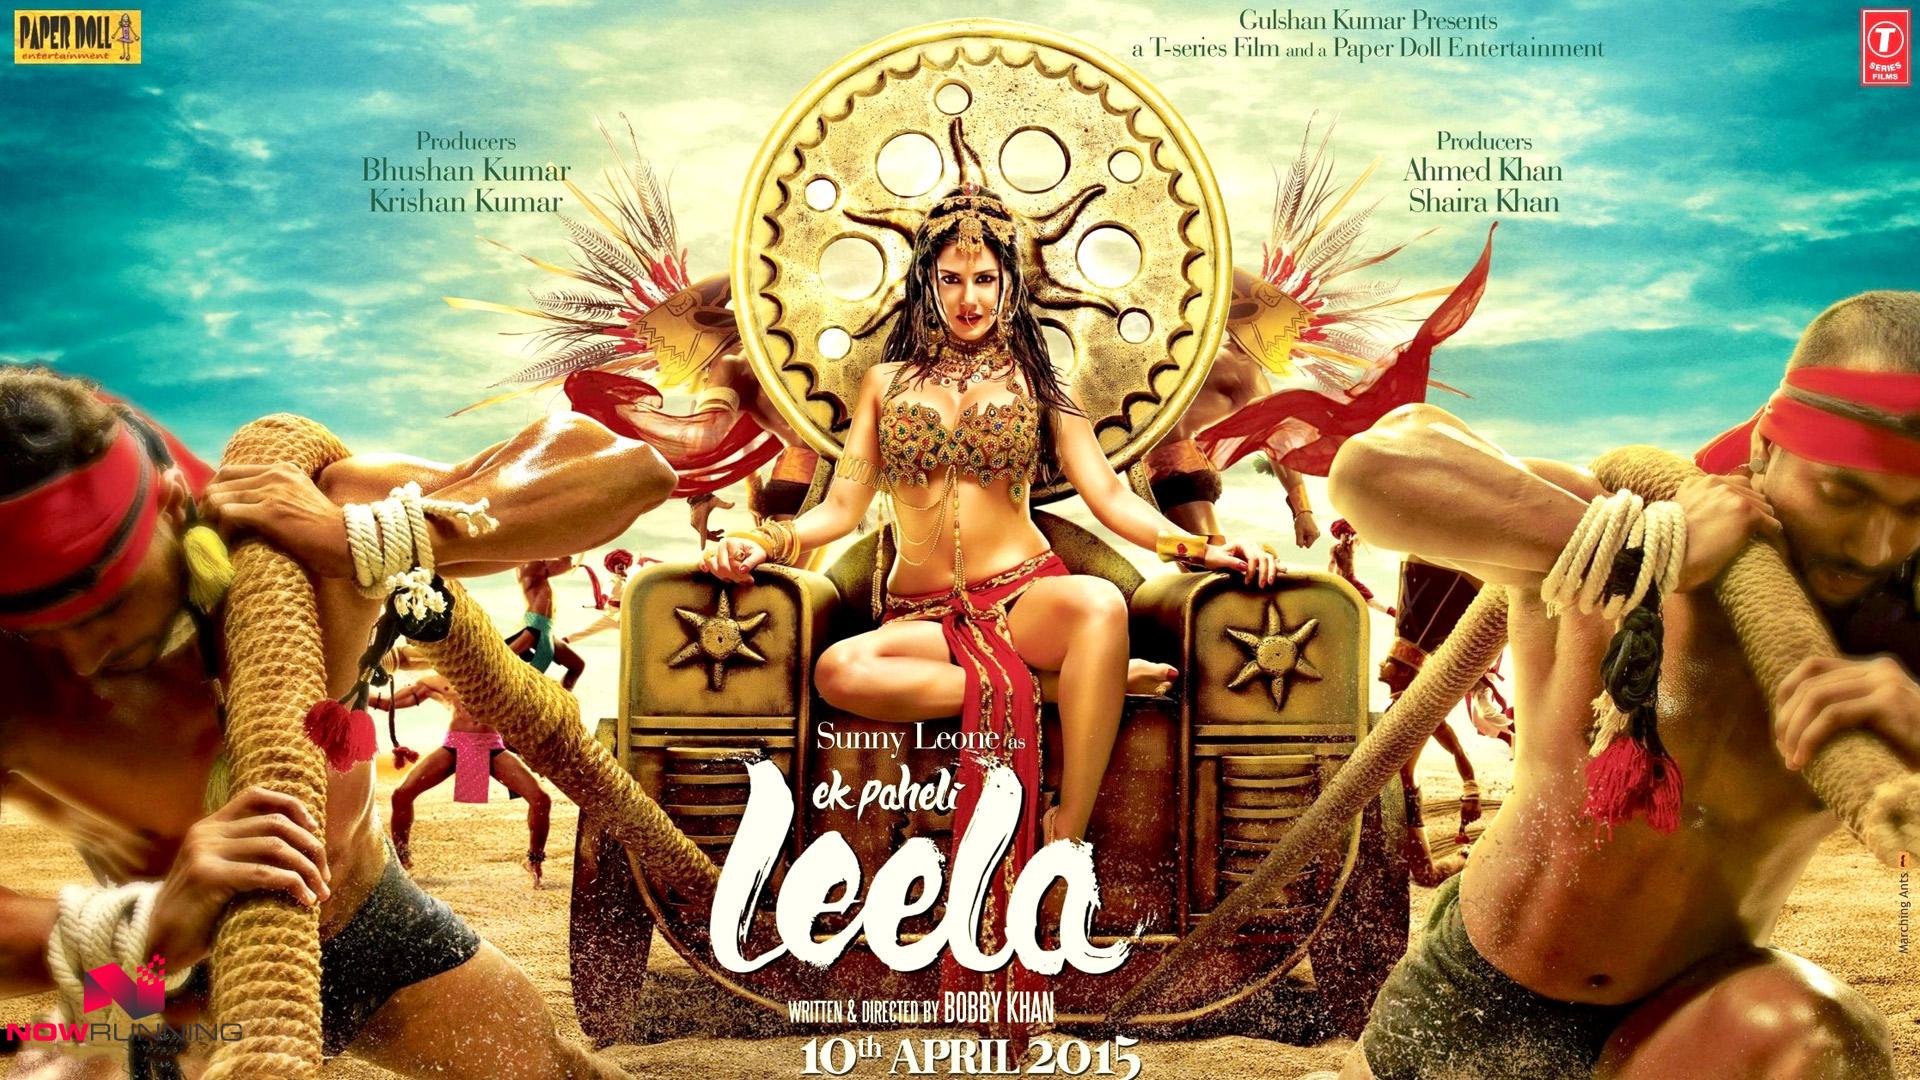 comunidad steam xvid ek paheli leela full movie download